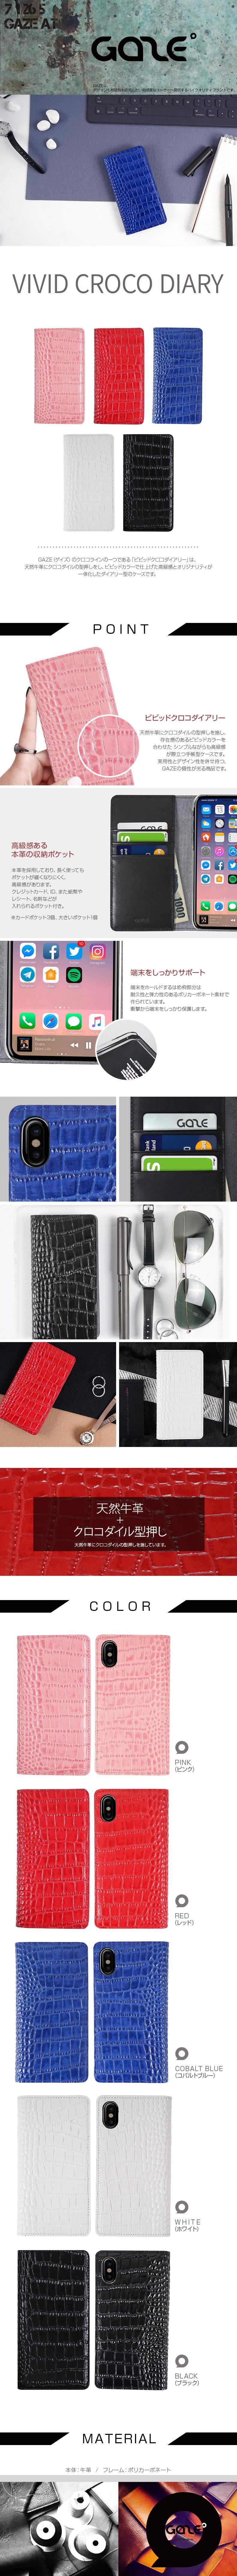 915a624d8f 【】【送料無料】 アイフォン XS ケース iPhone XS ケース / iPhone X ケース 手帳型 本革 レザー GAZE Vivid  Croco Diary for iPhoneXS 手帳 ケース 本革 ...